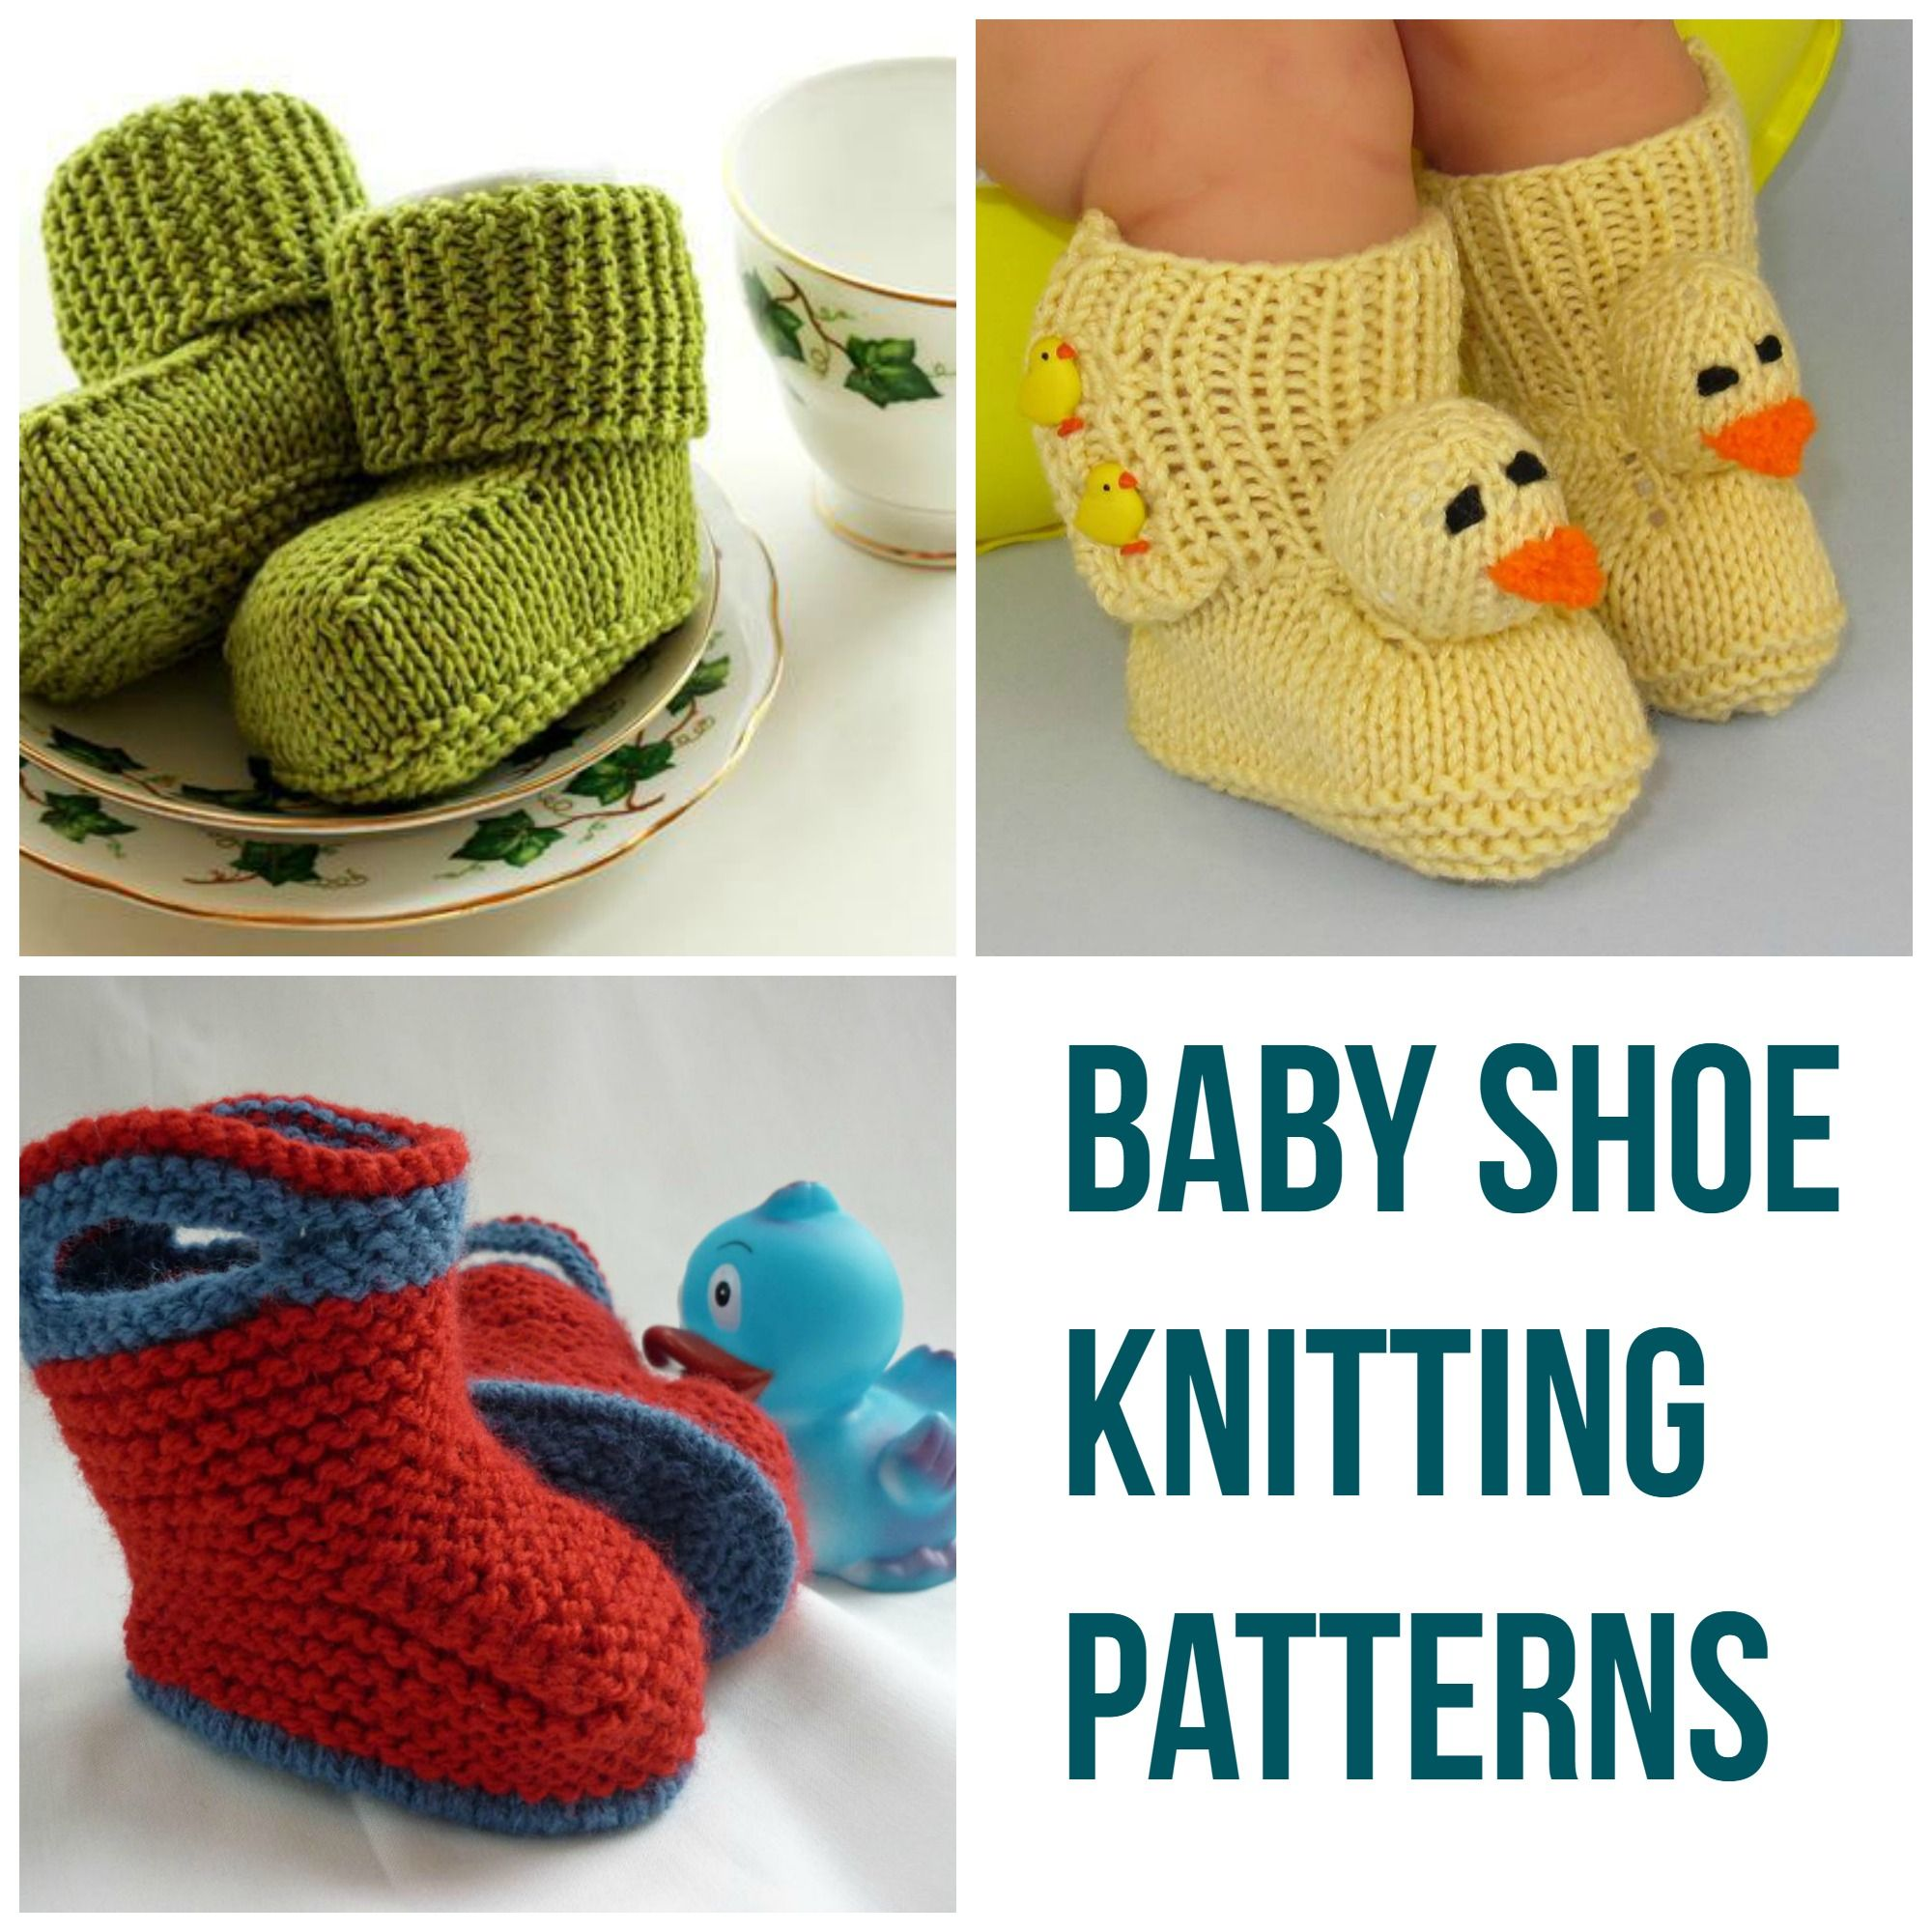 Too-Cute Kicks: Baby Shoe Knitting Patterns   Knitting patterns ...